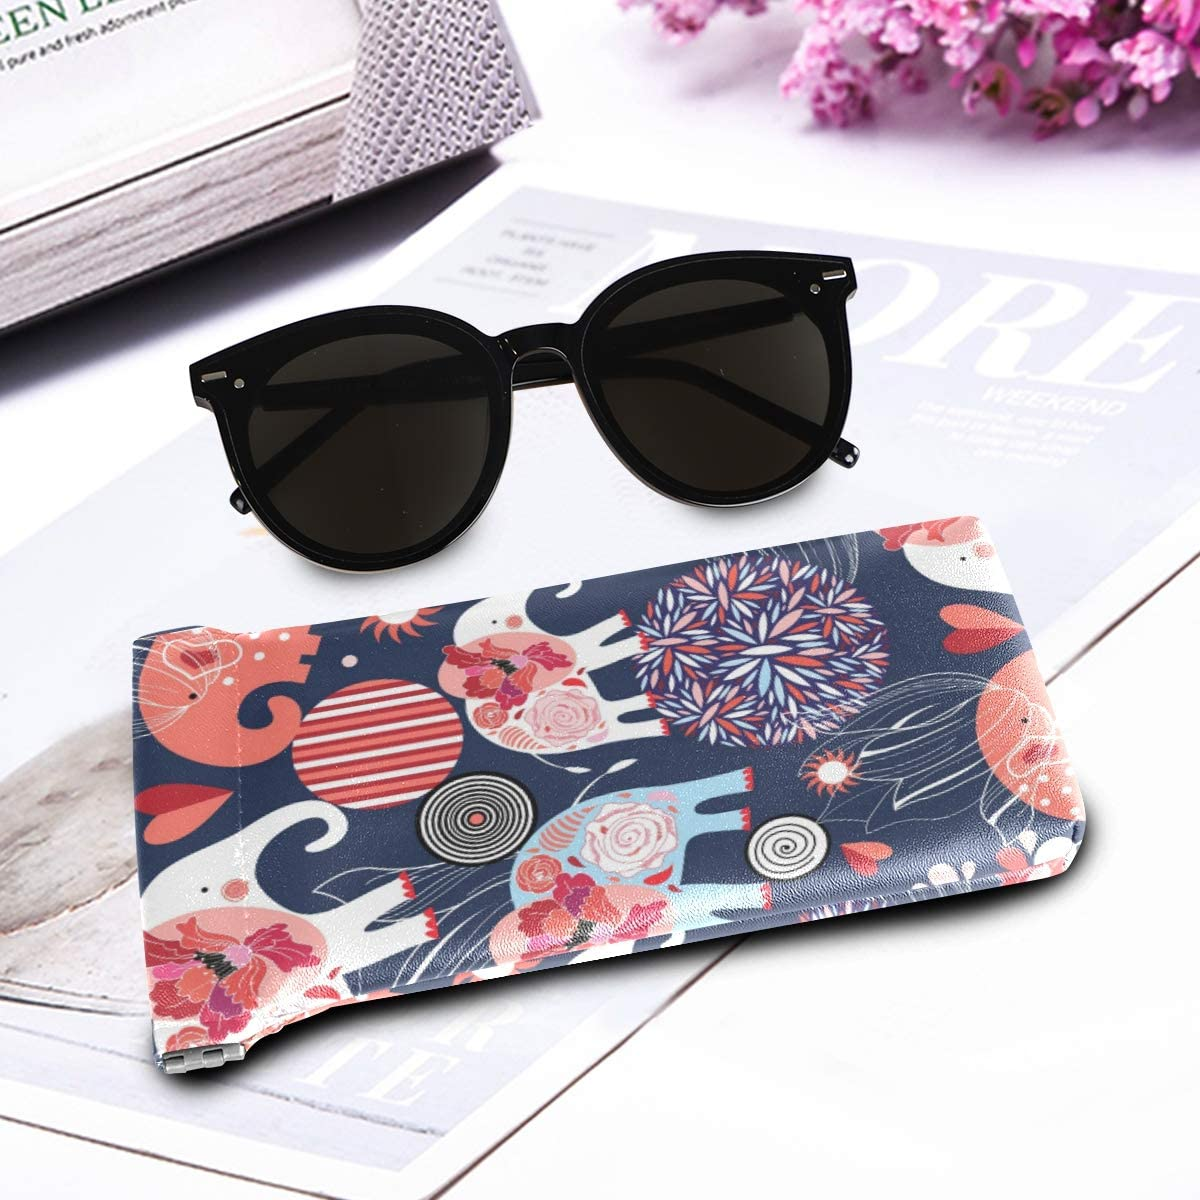 Squeeze Top Fashion Glasses Case Illustrator Octopus Portable Womens Sunglass Case Eyeglass Cases Sunglasses Pouch Eyeglass Bag